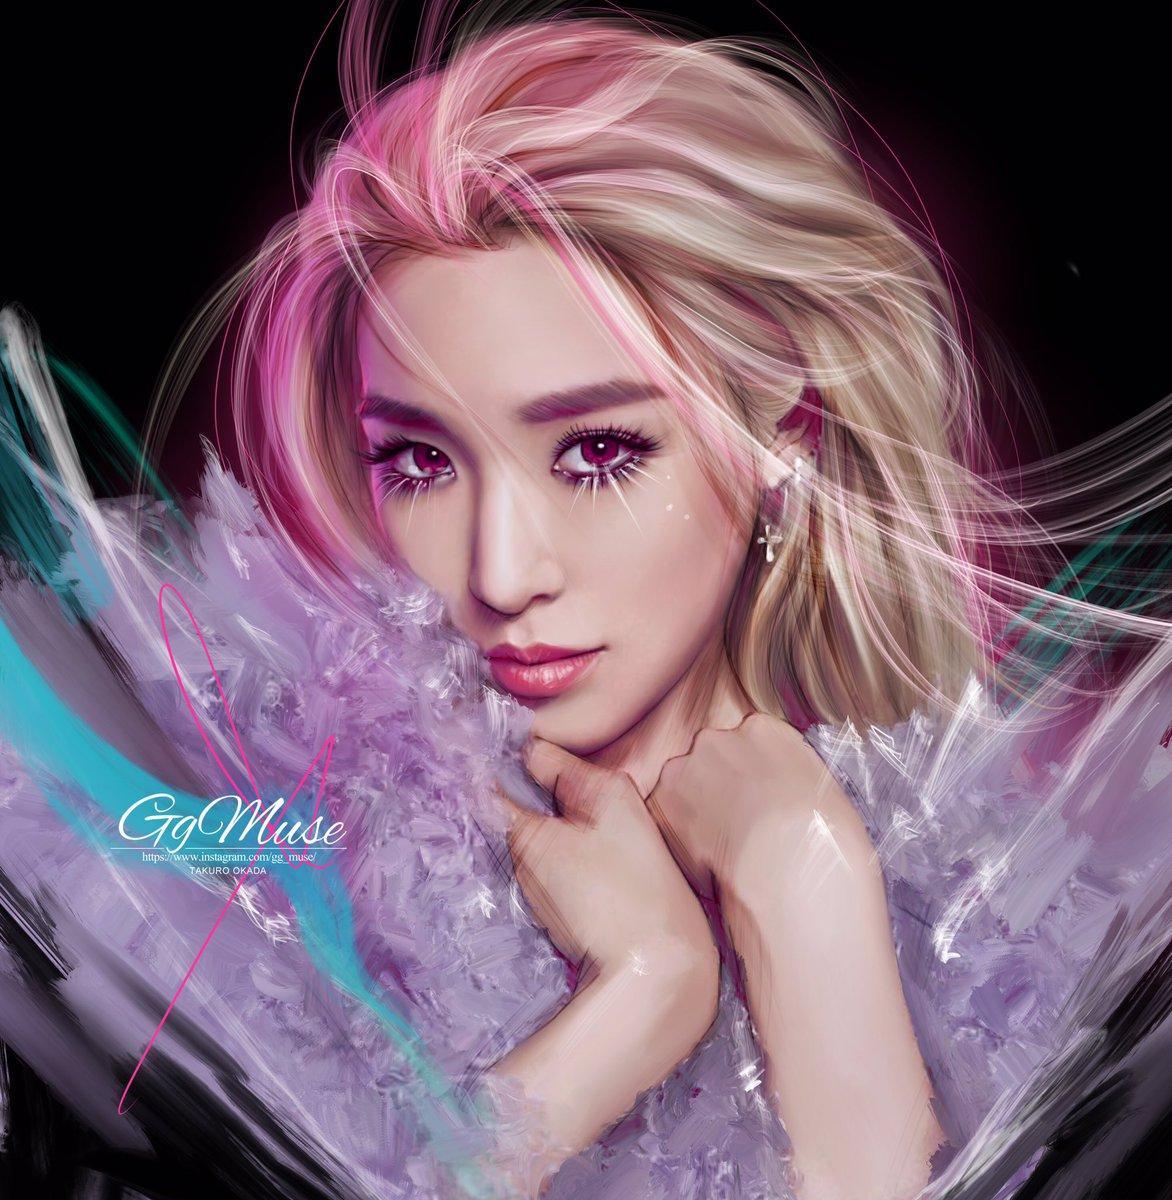 """Be Gorgeous"" But we stay girls...#tiffany #티파니 #ティファニー #黃美英 #tiffanyyoung @tiffanyyoung #OhGG #소녀시대 #少女時代 #GG #SNSD #girlsgeneration #cool #arthttps://www.instagram.com/gg_muse/"